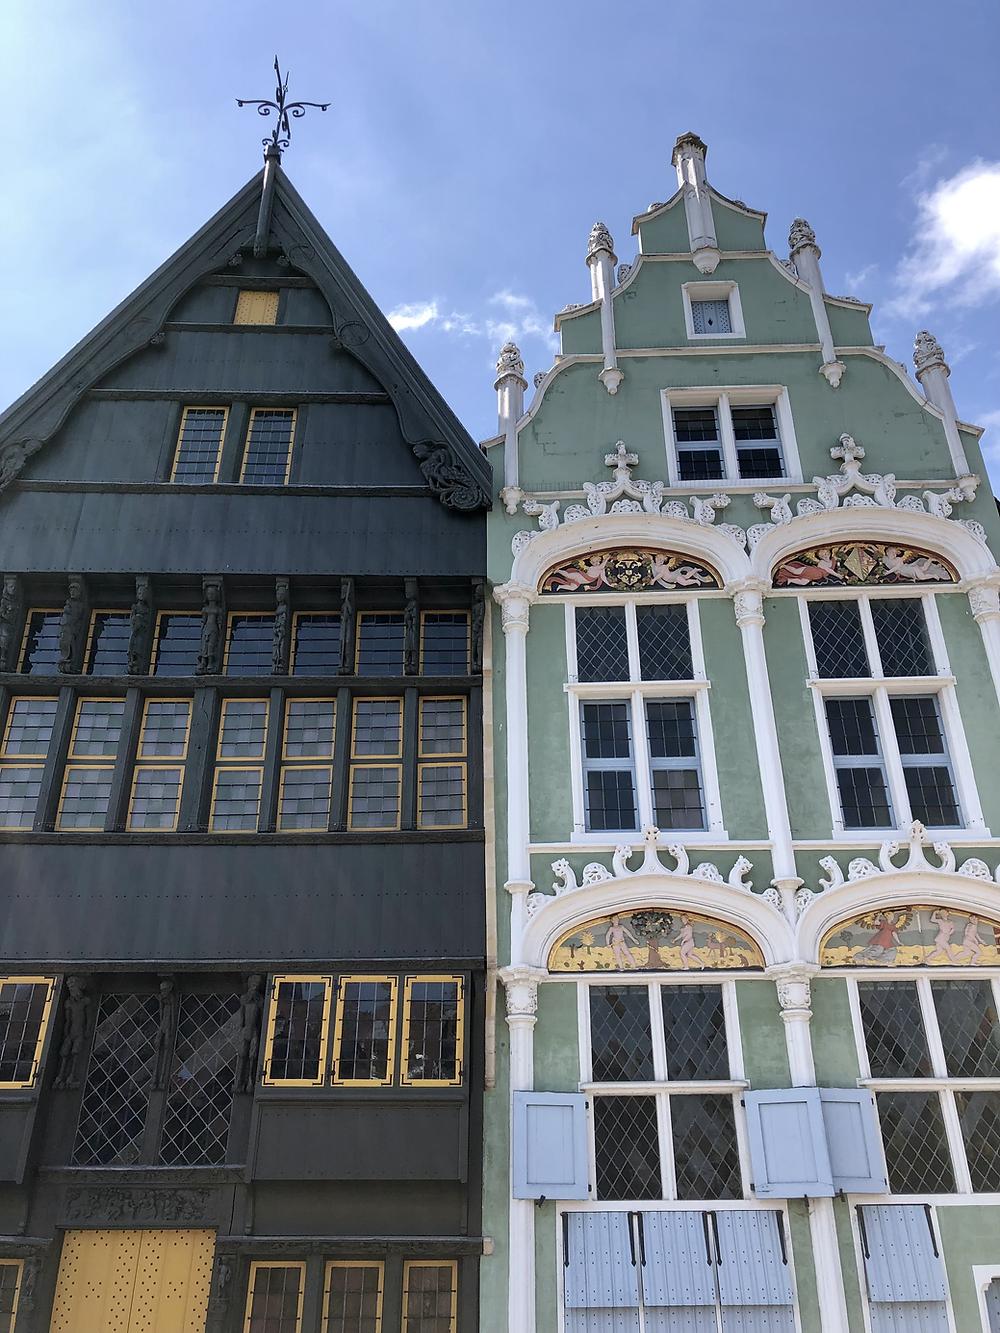 Architecture of Mechelen Belgium